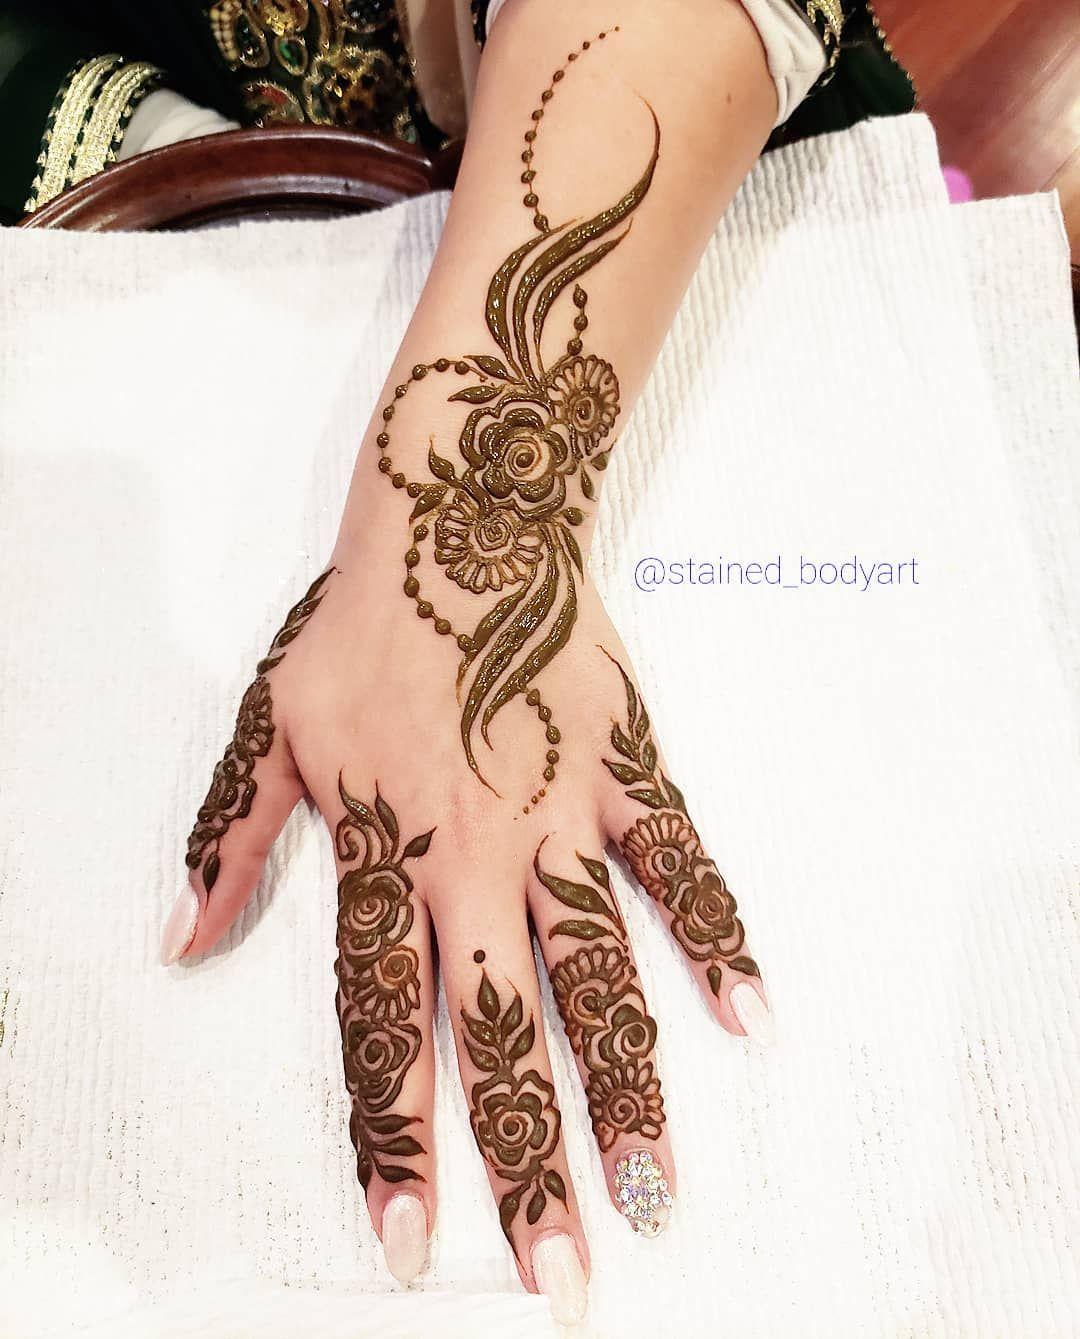 Khaleeji Henna Designs Tattoo: Gulf Style Or Khaleeji Style Henna